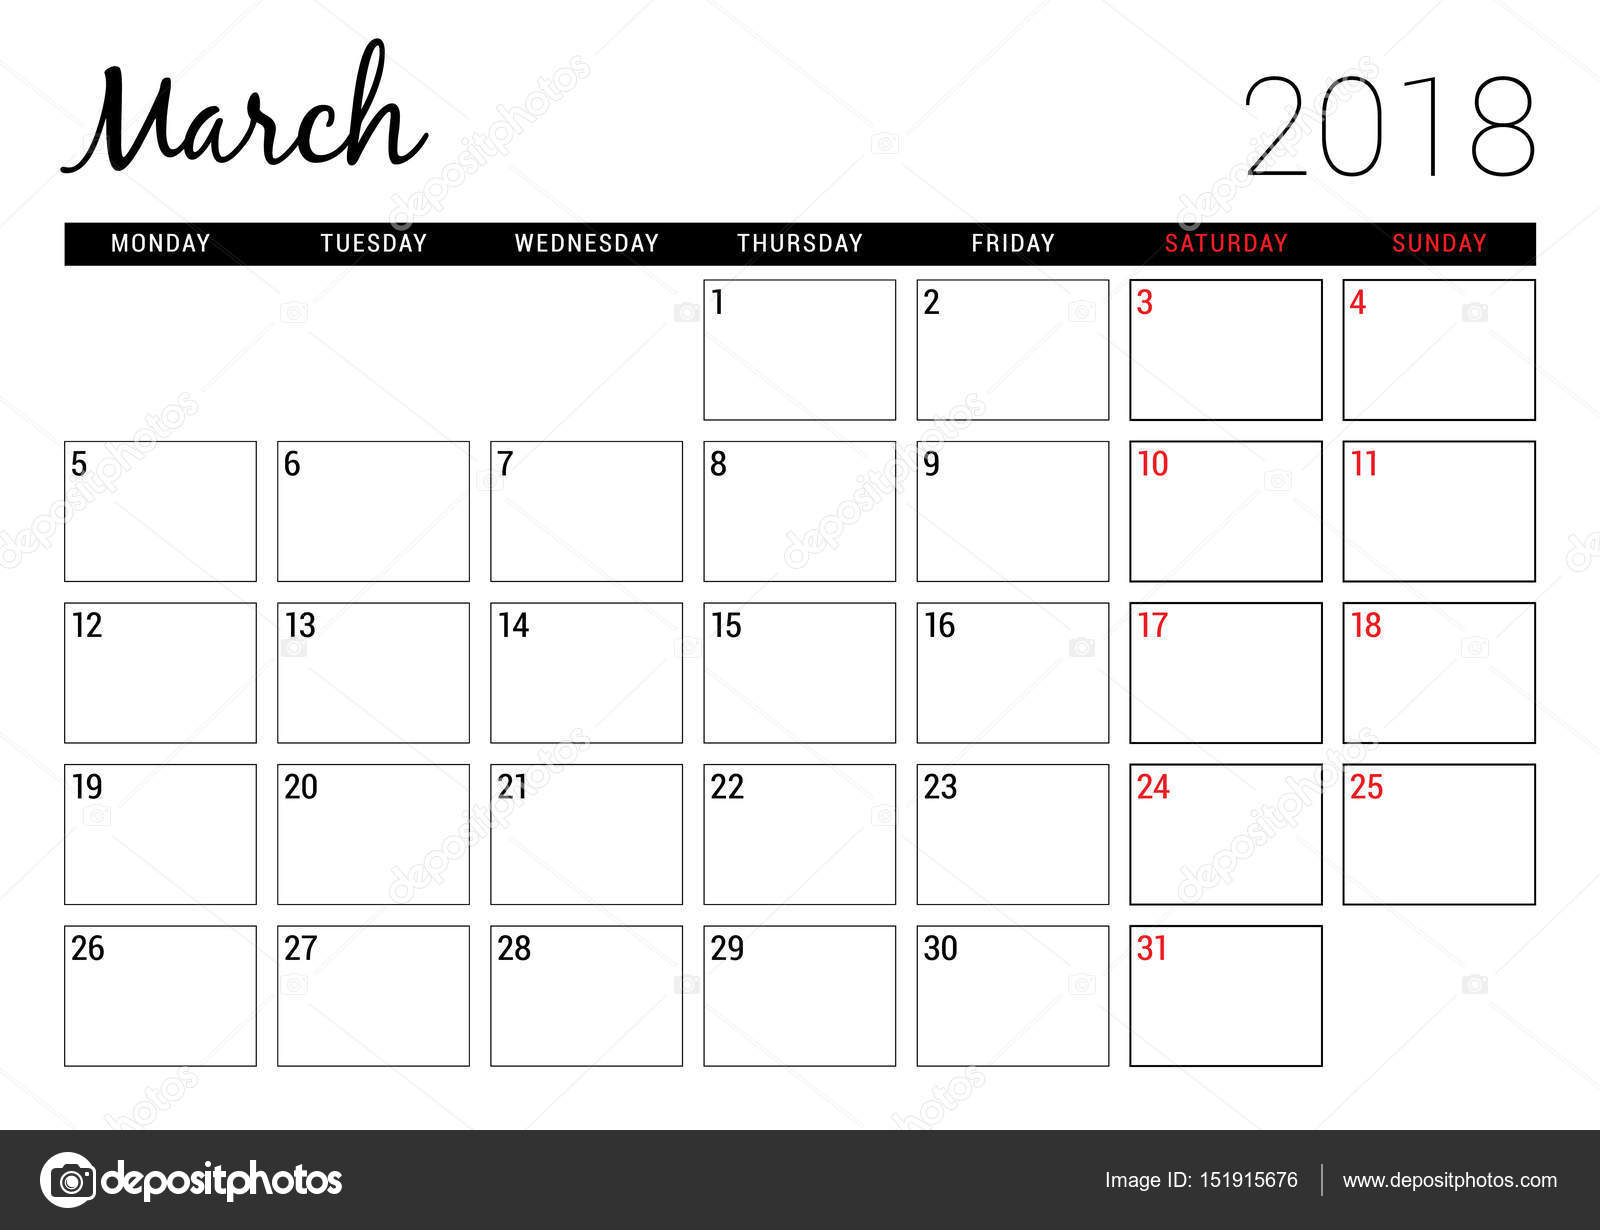 march 2018 printable calendar planner design template week starts on monday stationery design